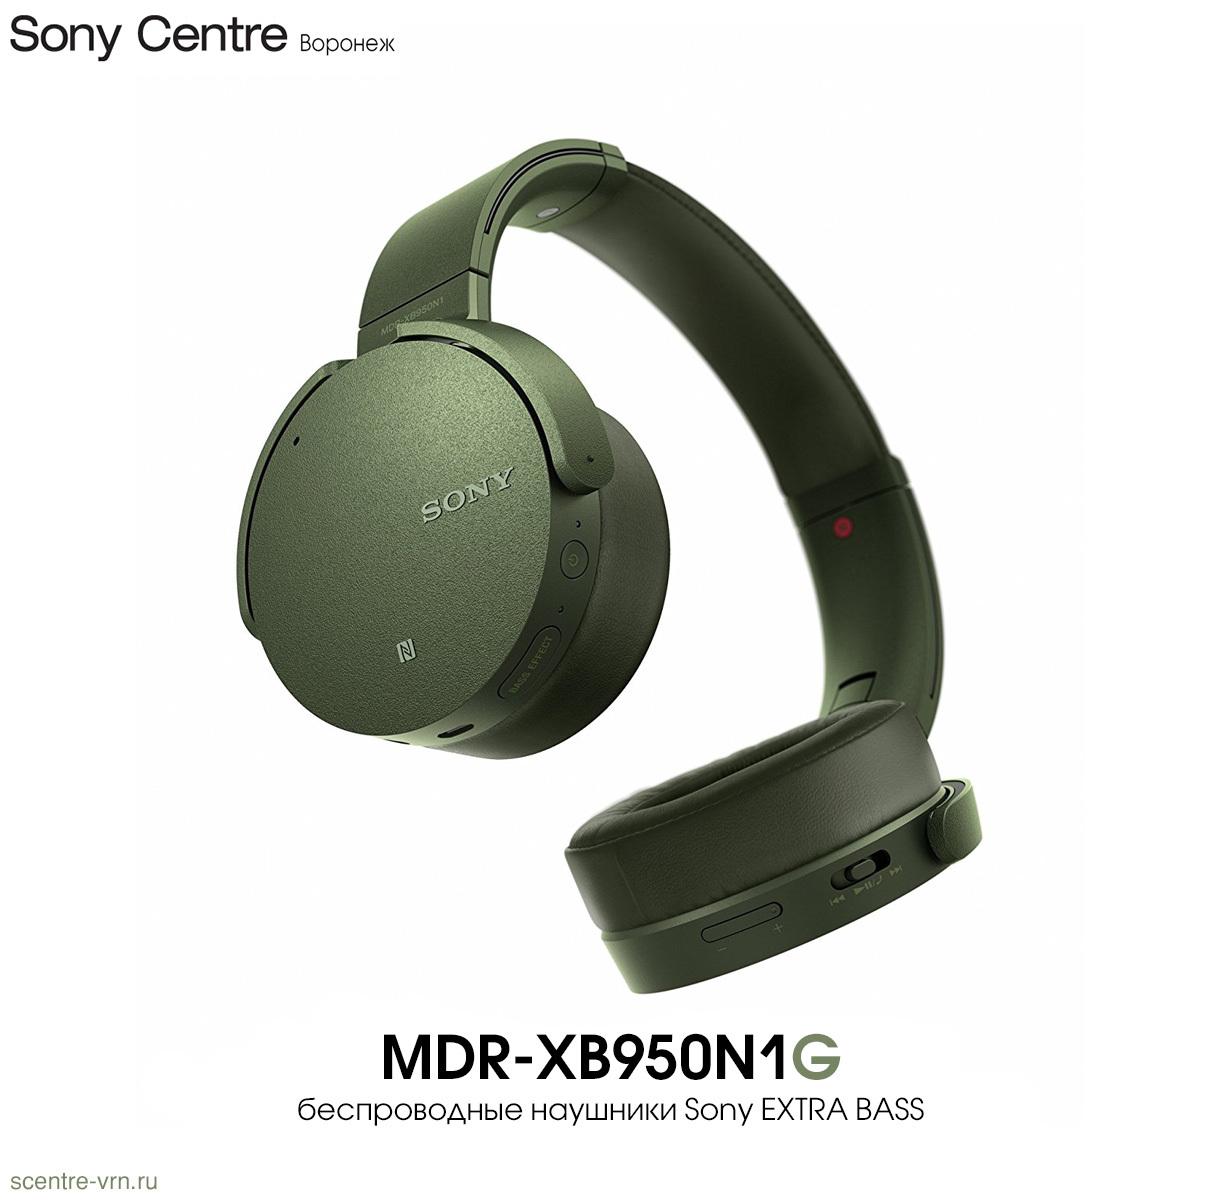 Беспроводные наушники Sony MDR-XB950N1G